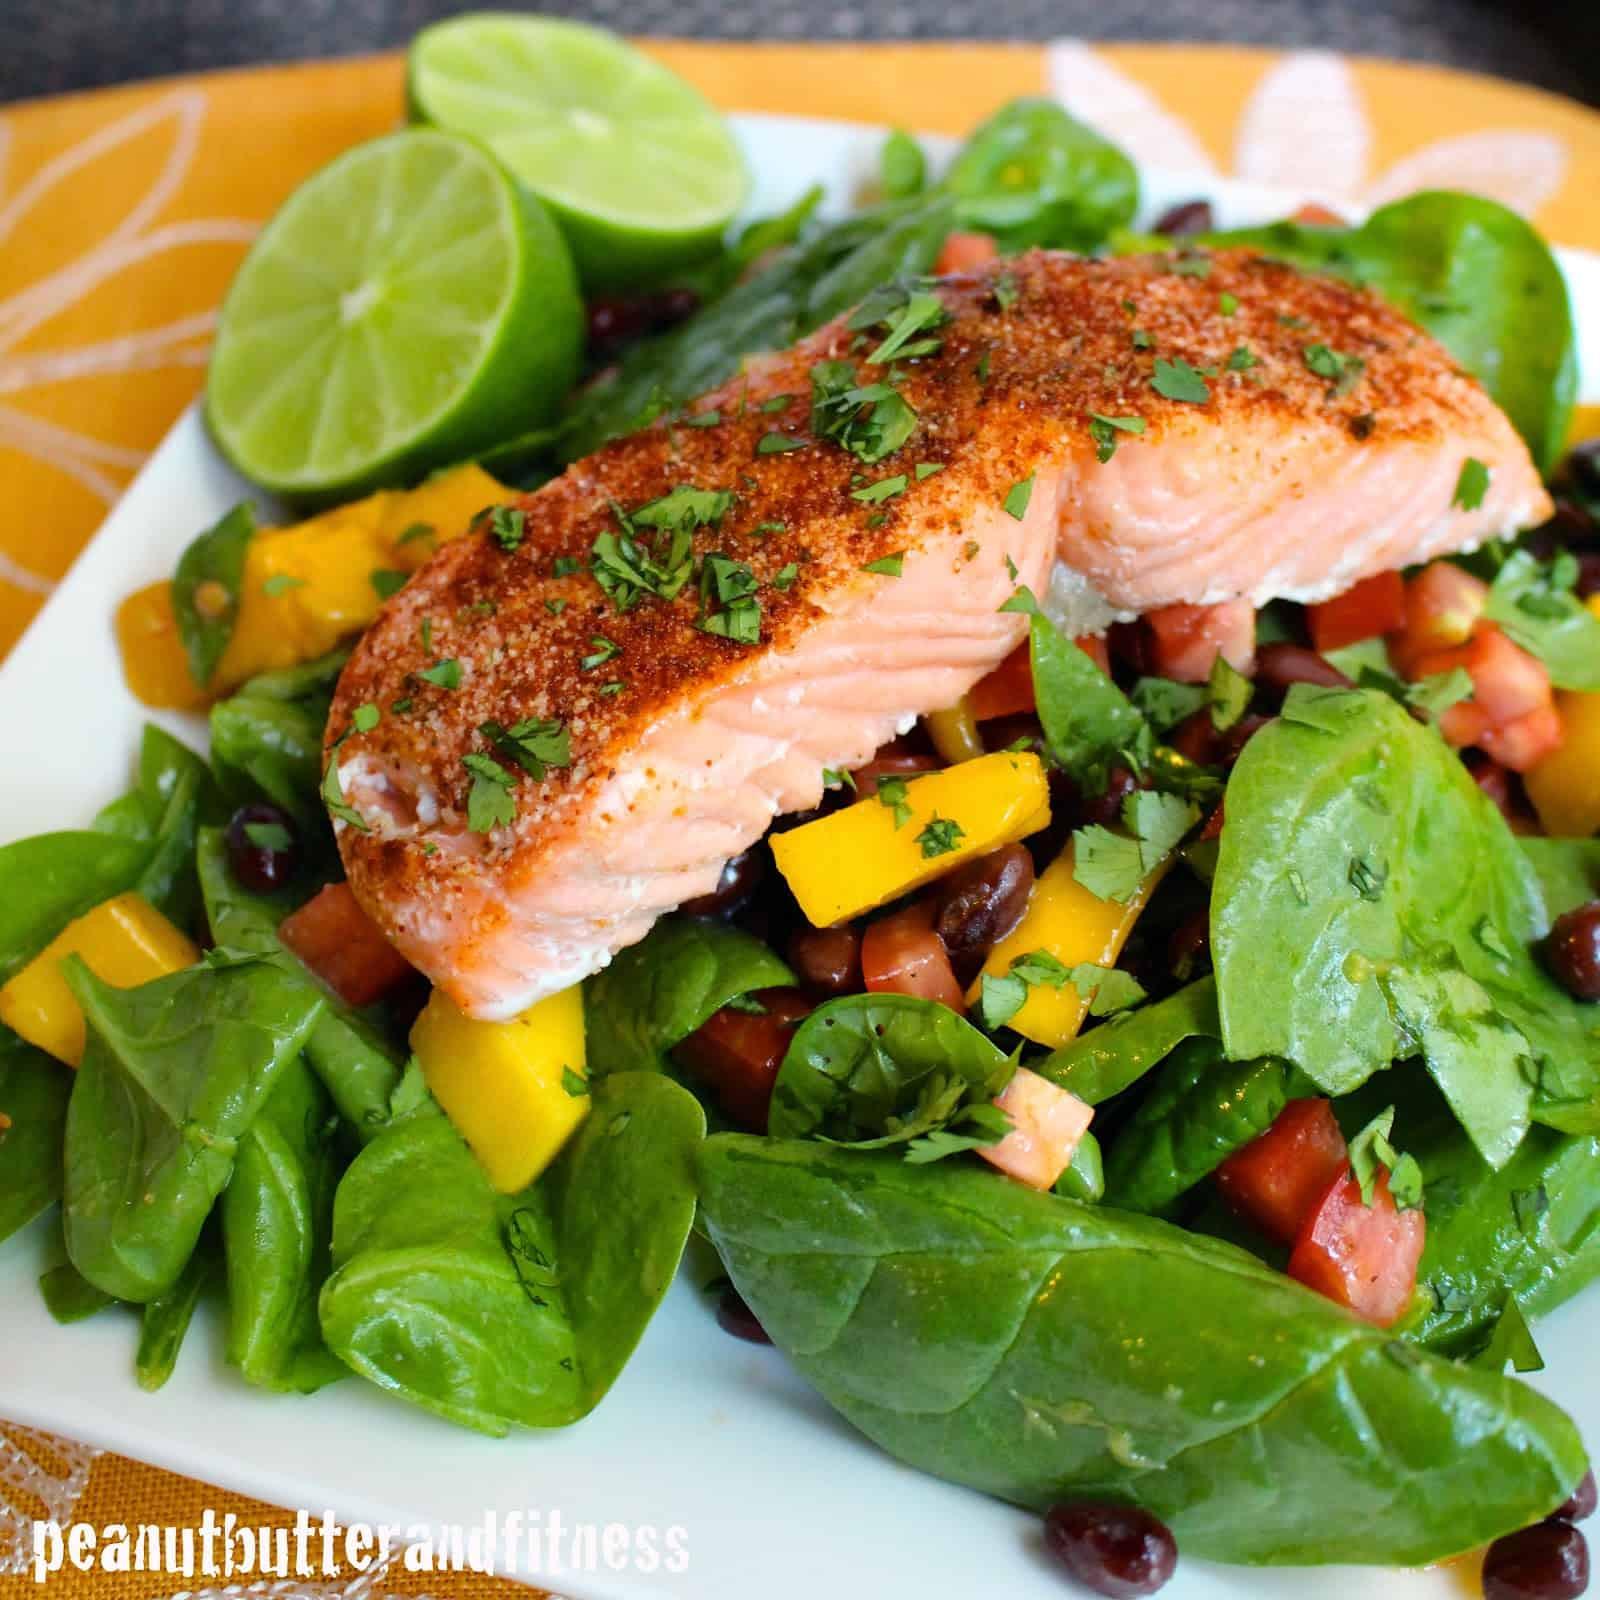 Salad With Salmon  Chili Lime Salmon Salad and Meal Prep Ideas Peanut